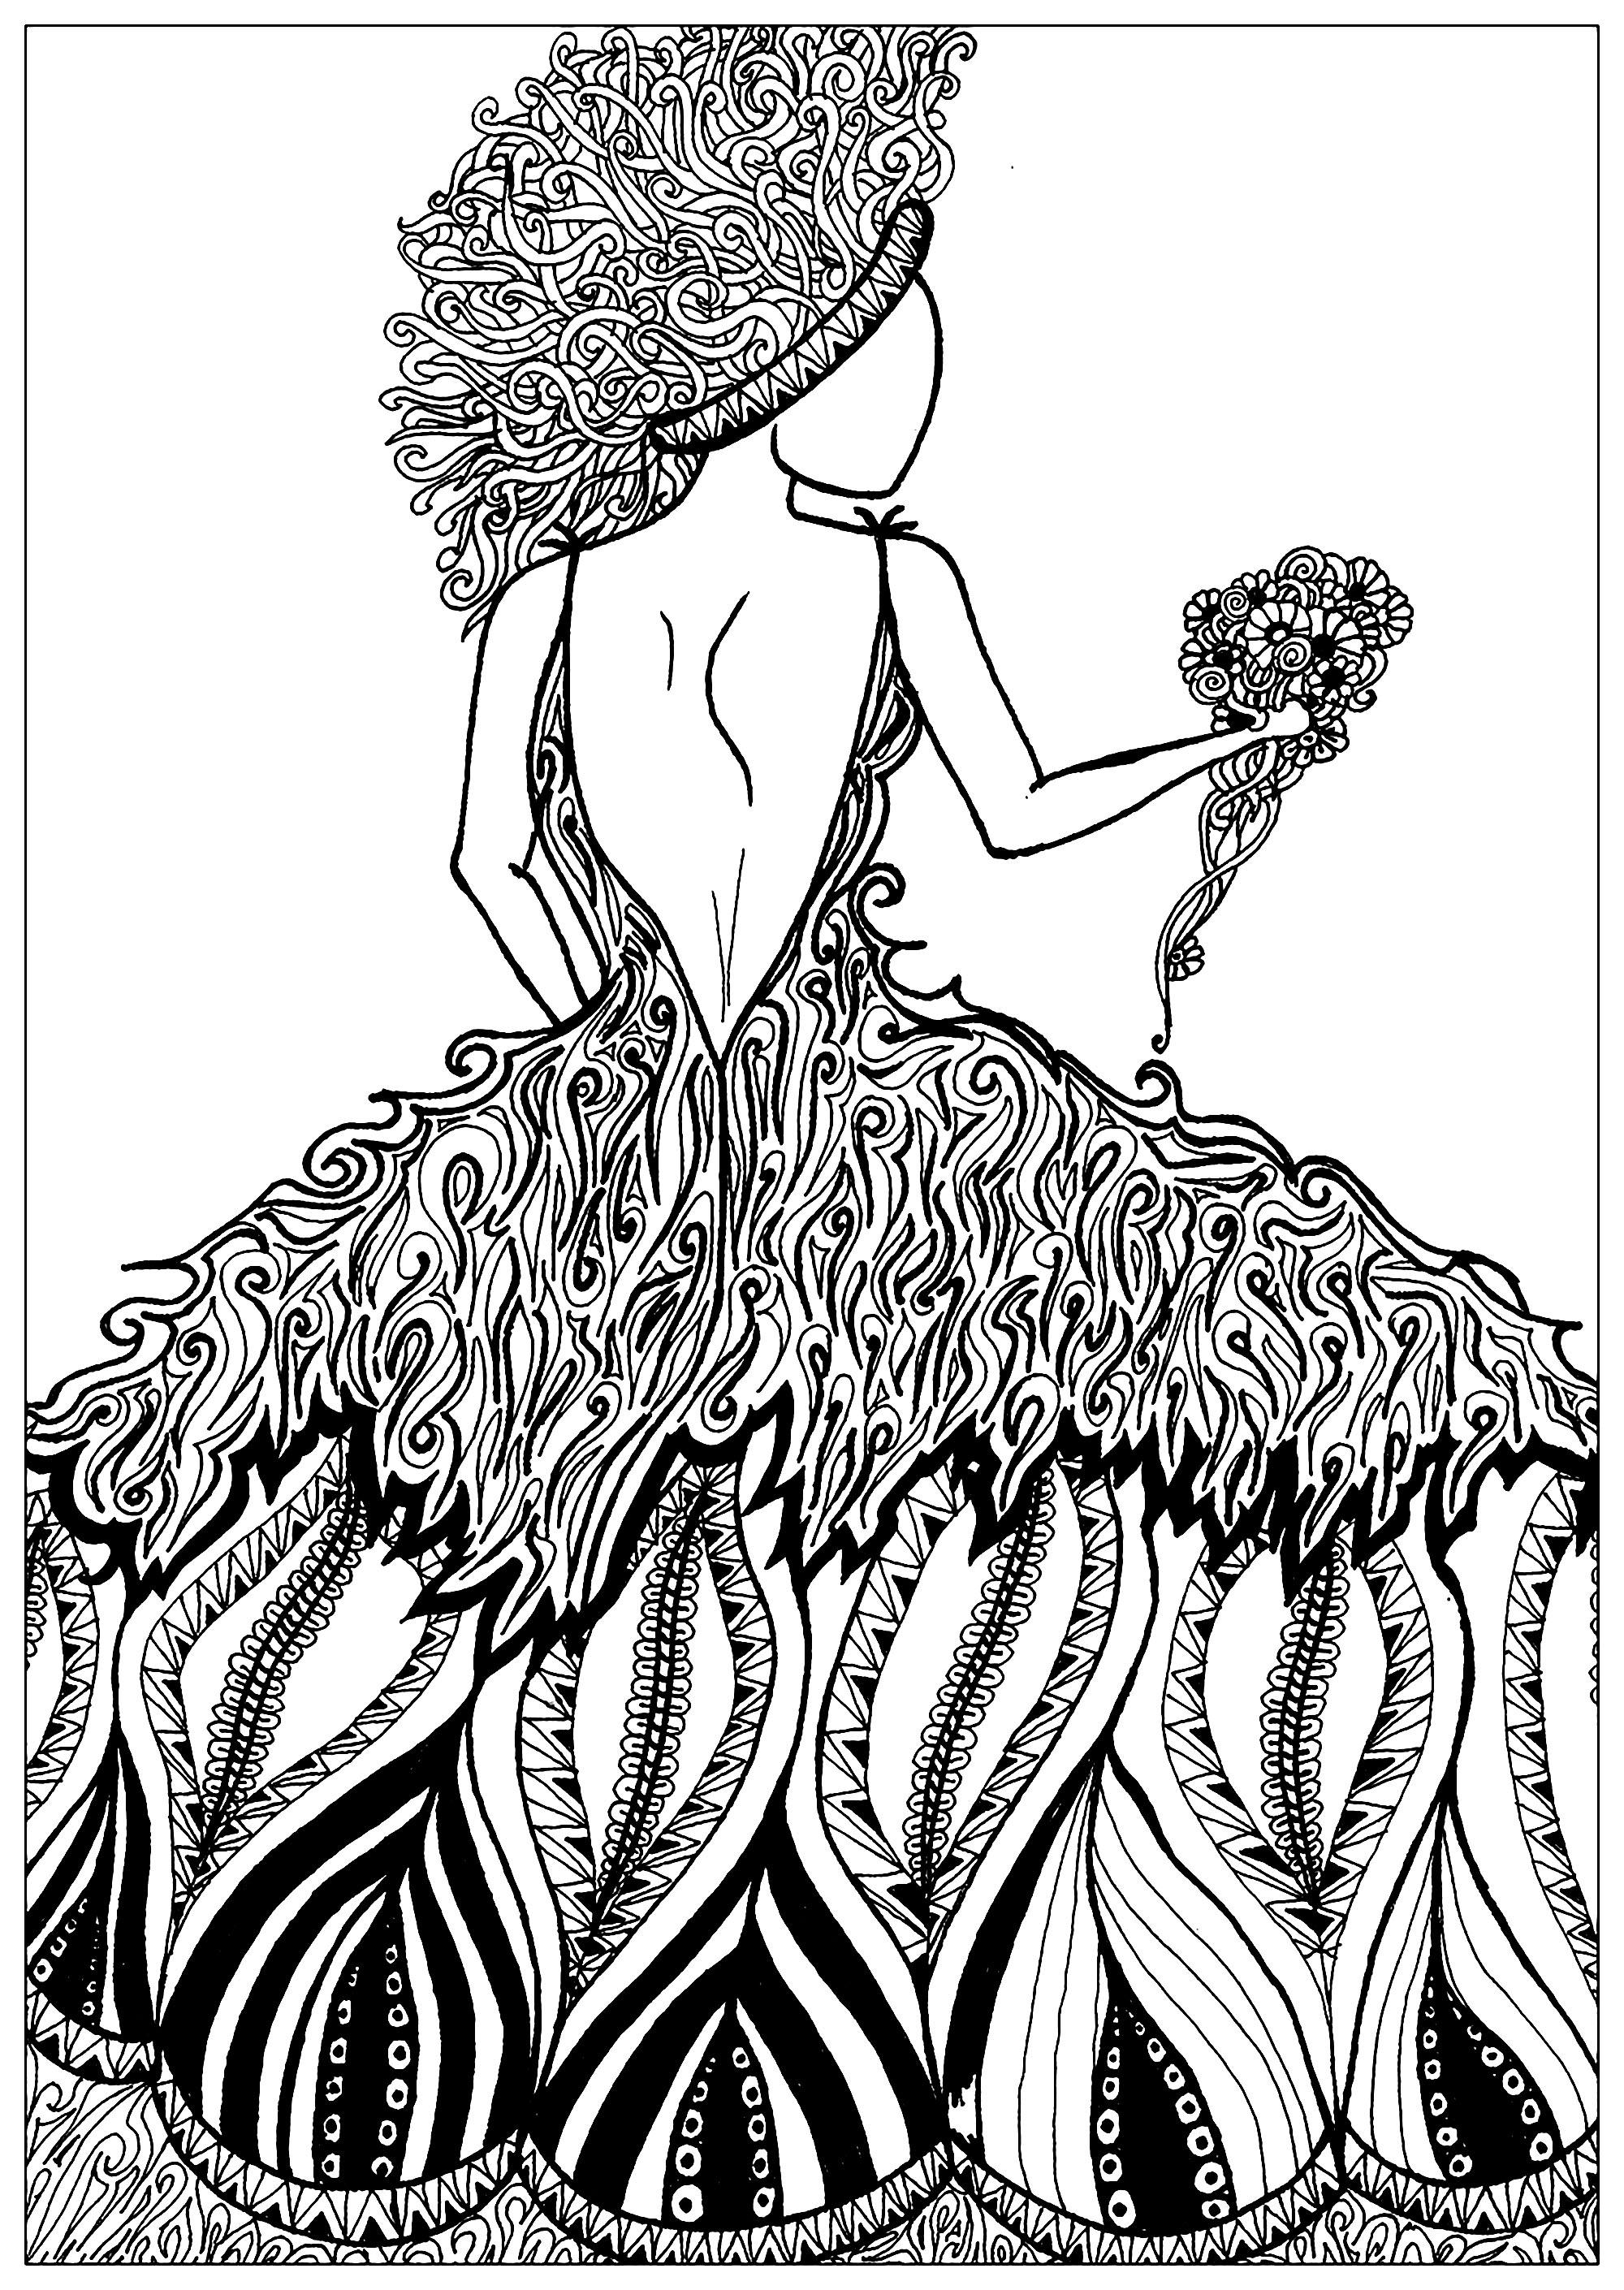 Elanise Art Femme Et Robe Fleurie Anti Stress Art Therapie